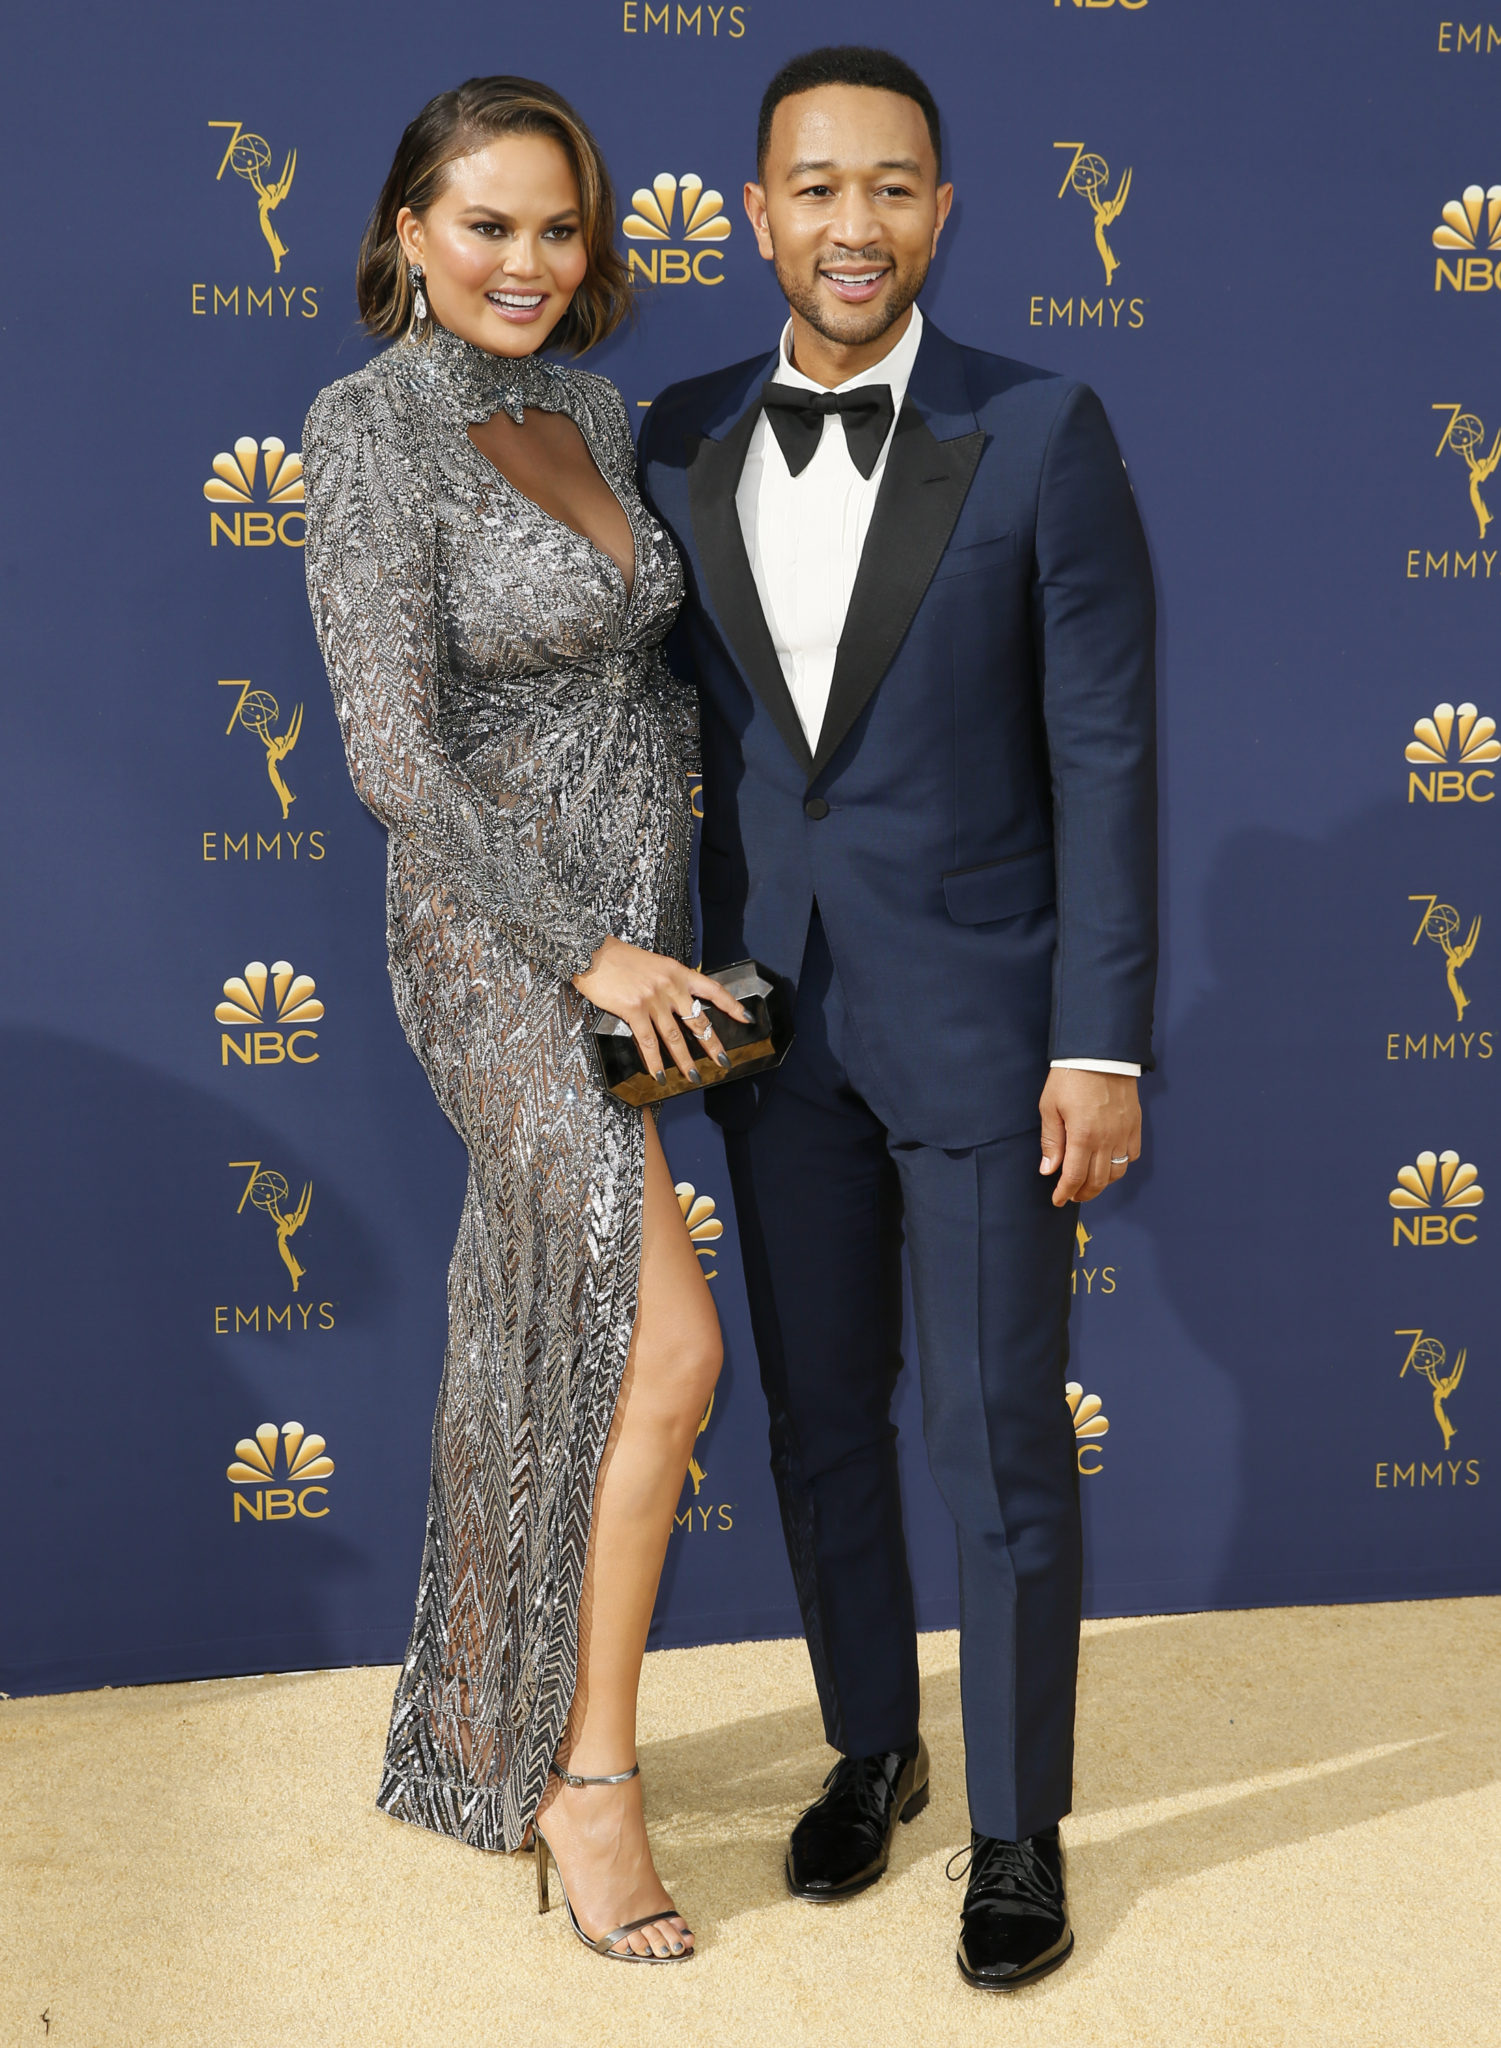 John Legend, Chrissy Teigen Emmys 4Chion Lifestyle